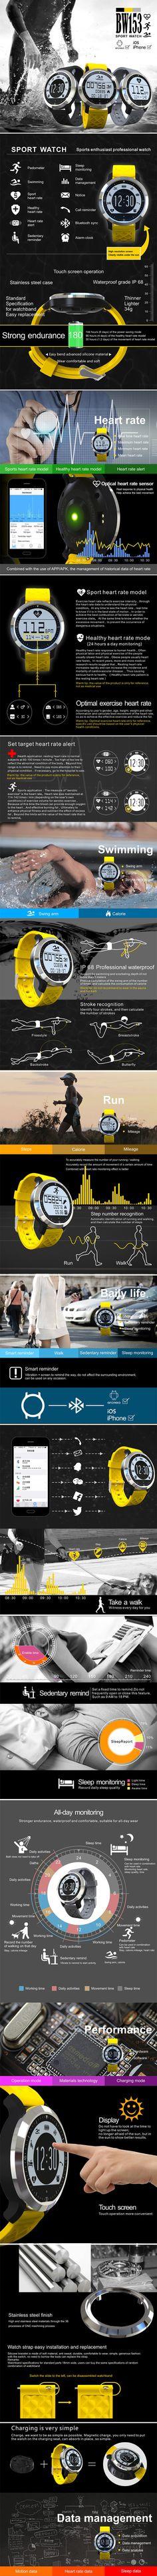 GX-BW153 Smart Bracelet Sleep Heart Rate Monitor IP68 Waterproof Fitness Tracker Sport Watch at Banggood